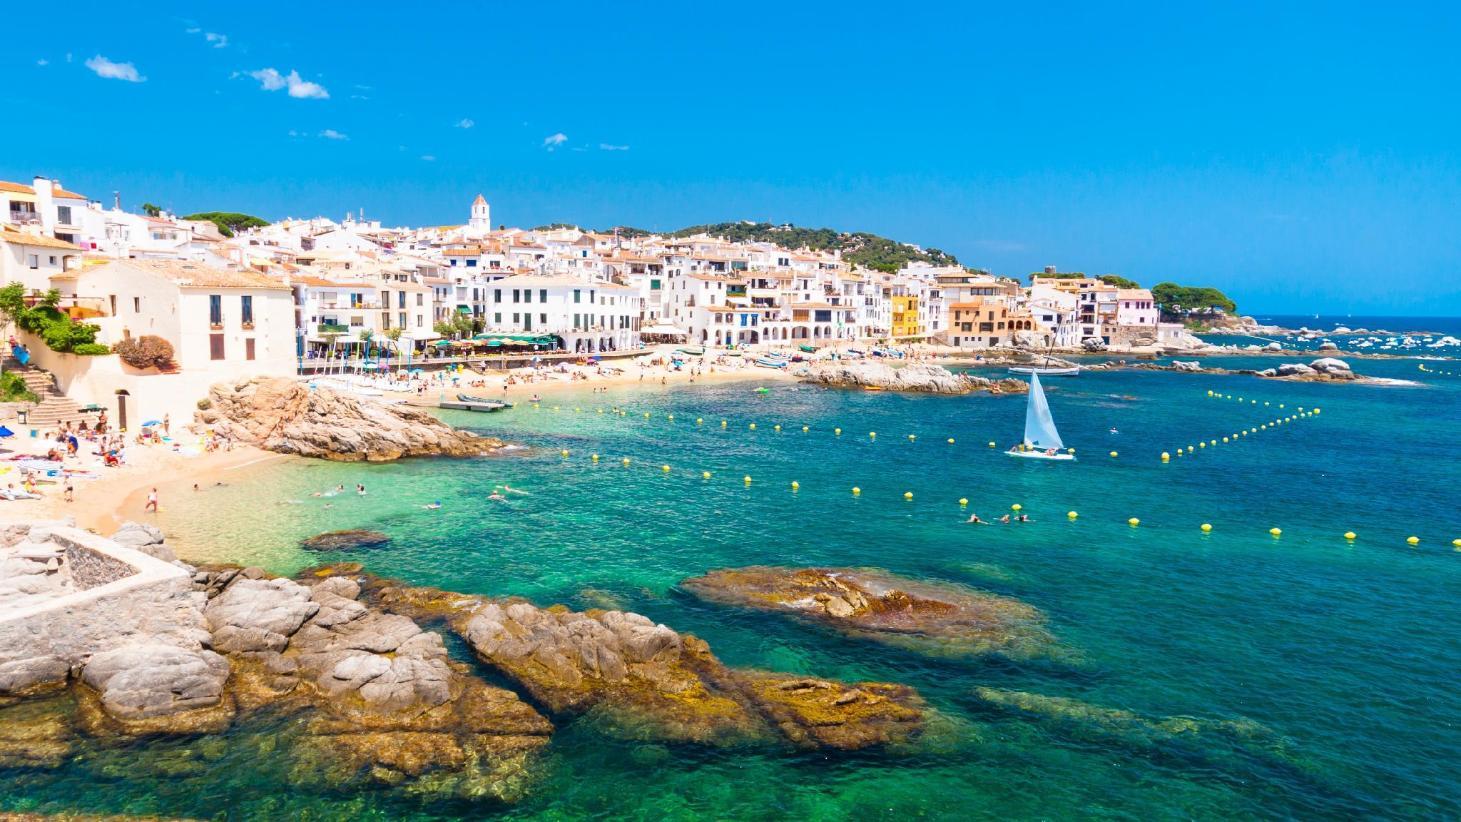 30 Best Calella De Palafrugell Hotels In 2020 Great Savings Reviews Of Hotels In Calella De Palafrugell Spain